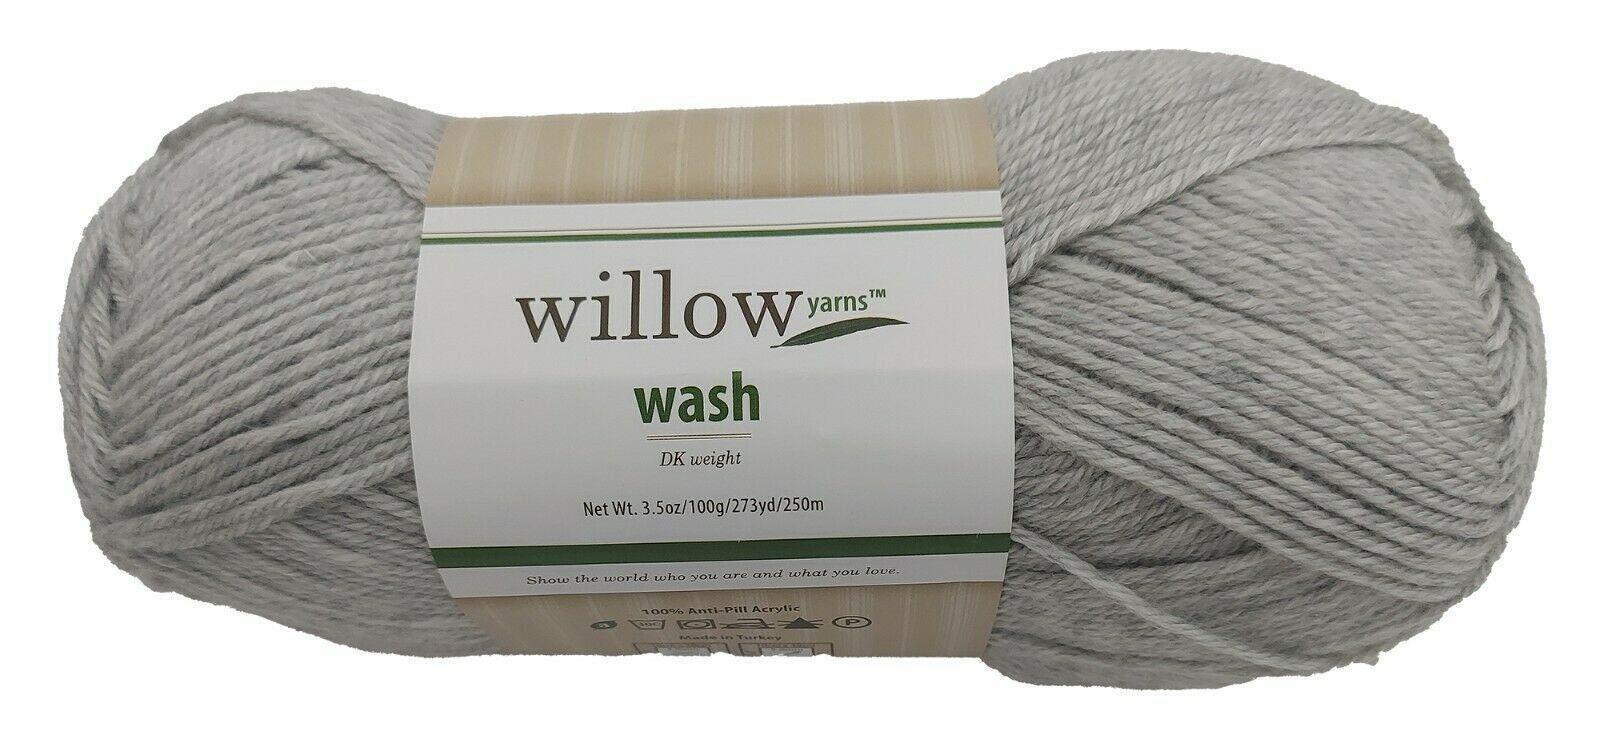 Willow Yarns Wash, DK Weight, Silver Birch Yarn #732251